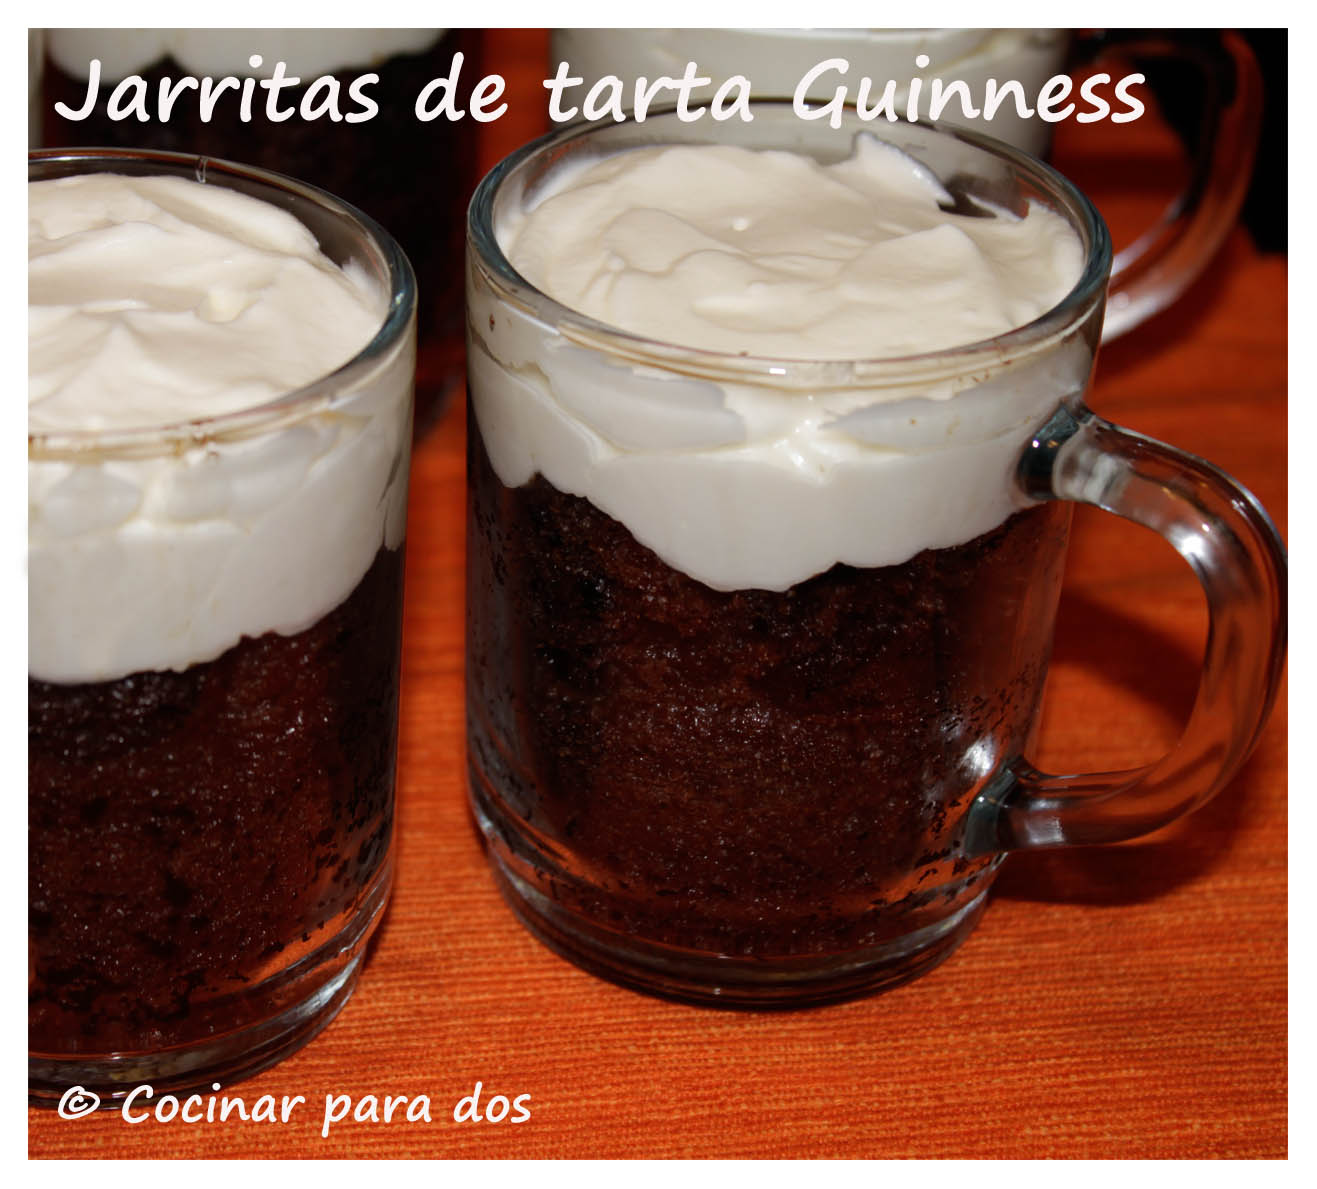 Jarritas de tarta guinness cocinar para 2 - Bizcocho microondas isasaweis ...